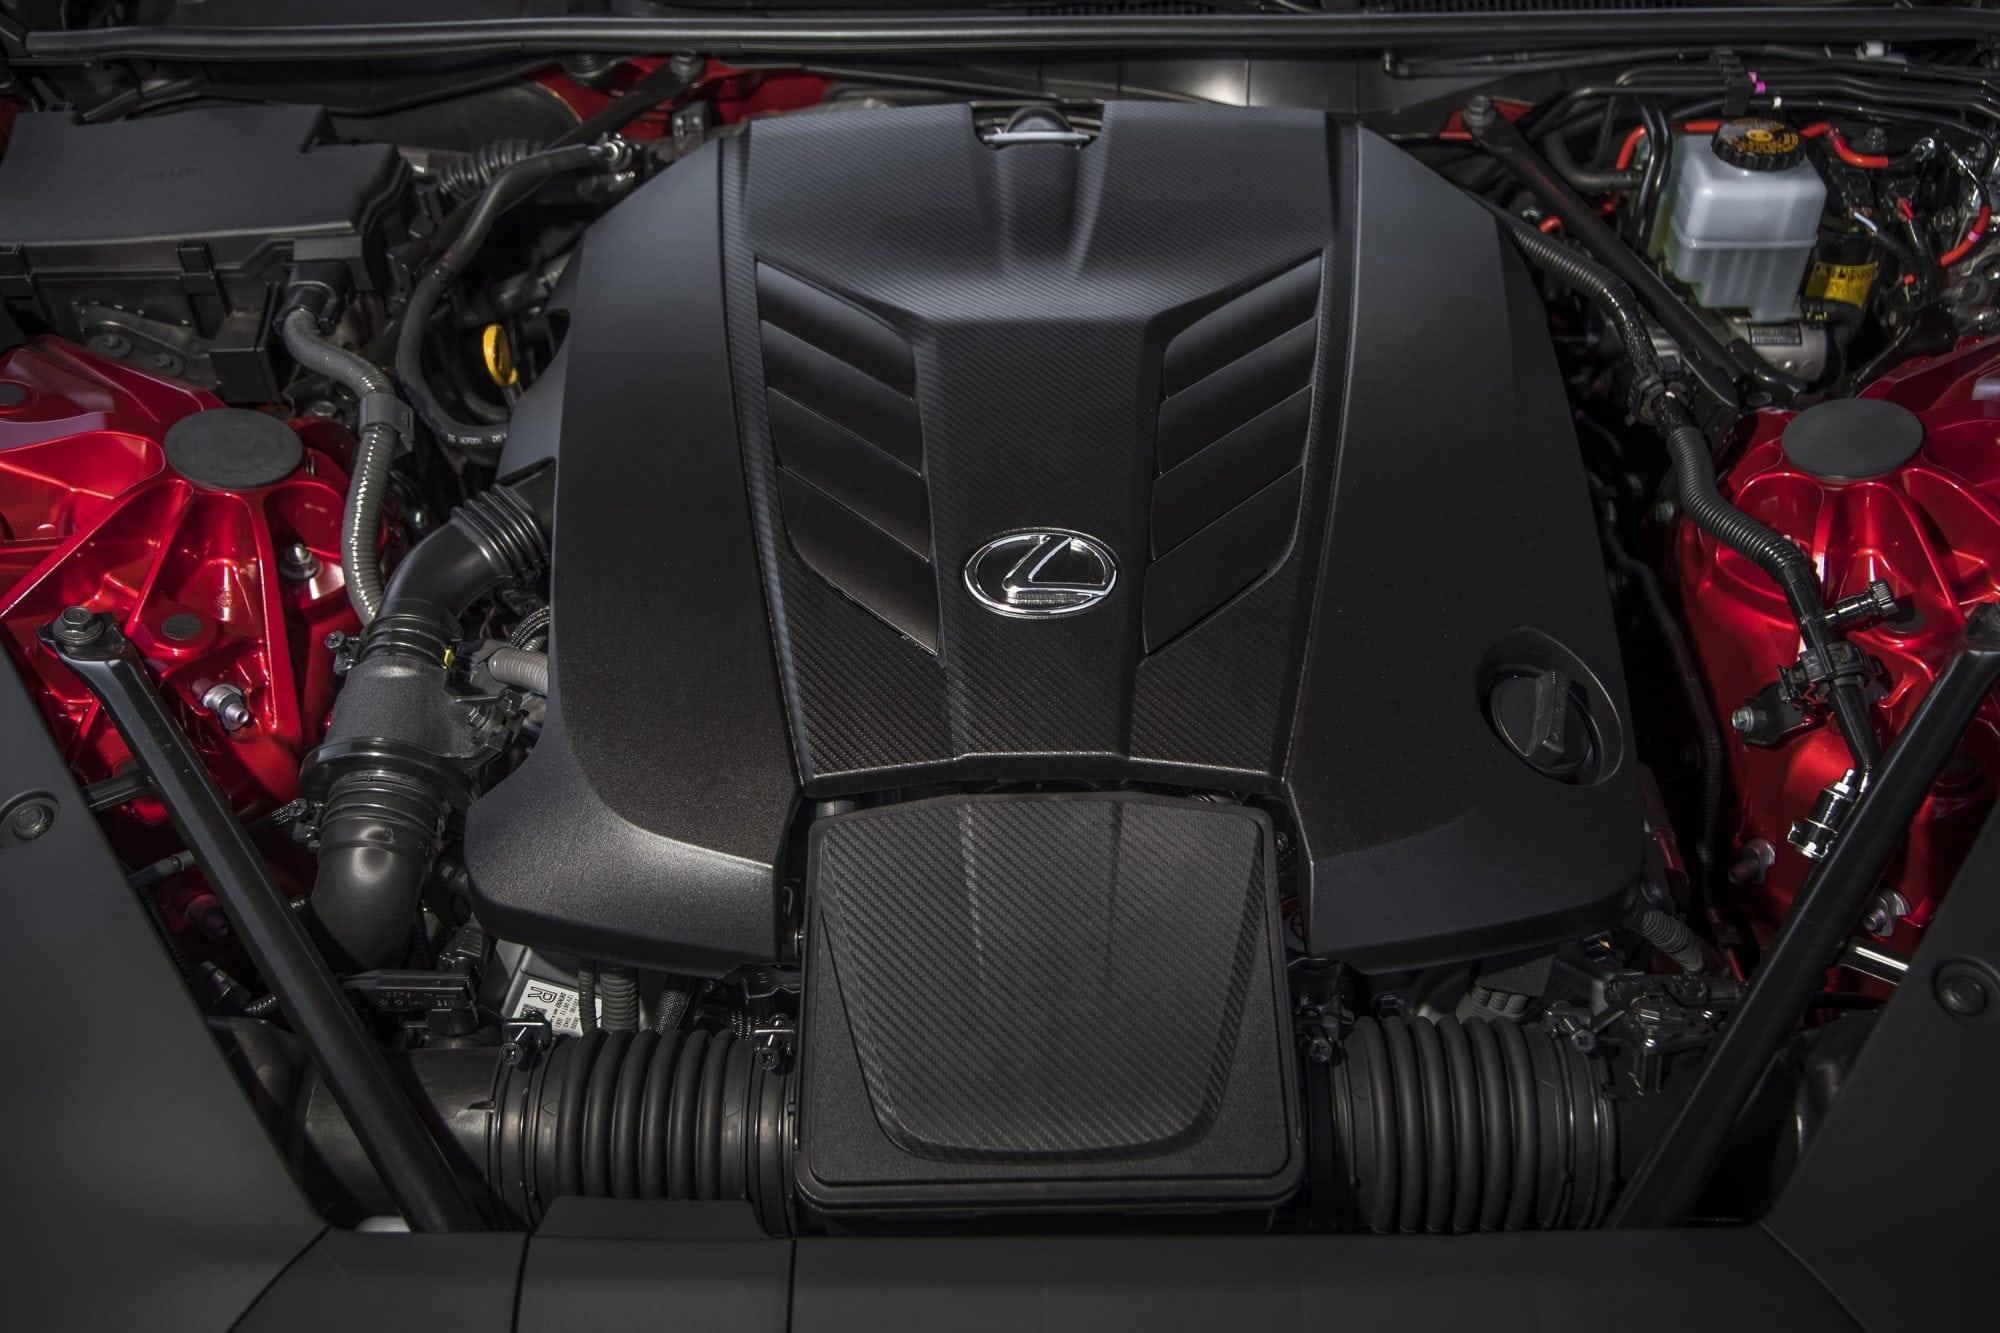 Super Hero Super Car Brand New Lexus Lc 500 Offers Blend Of